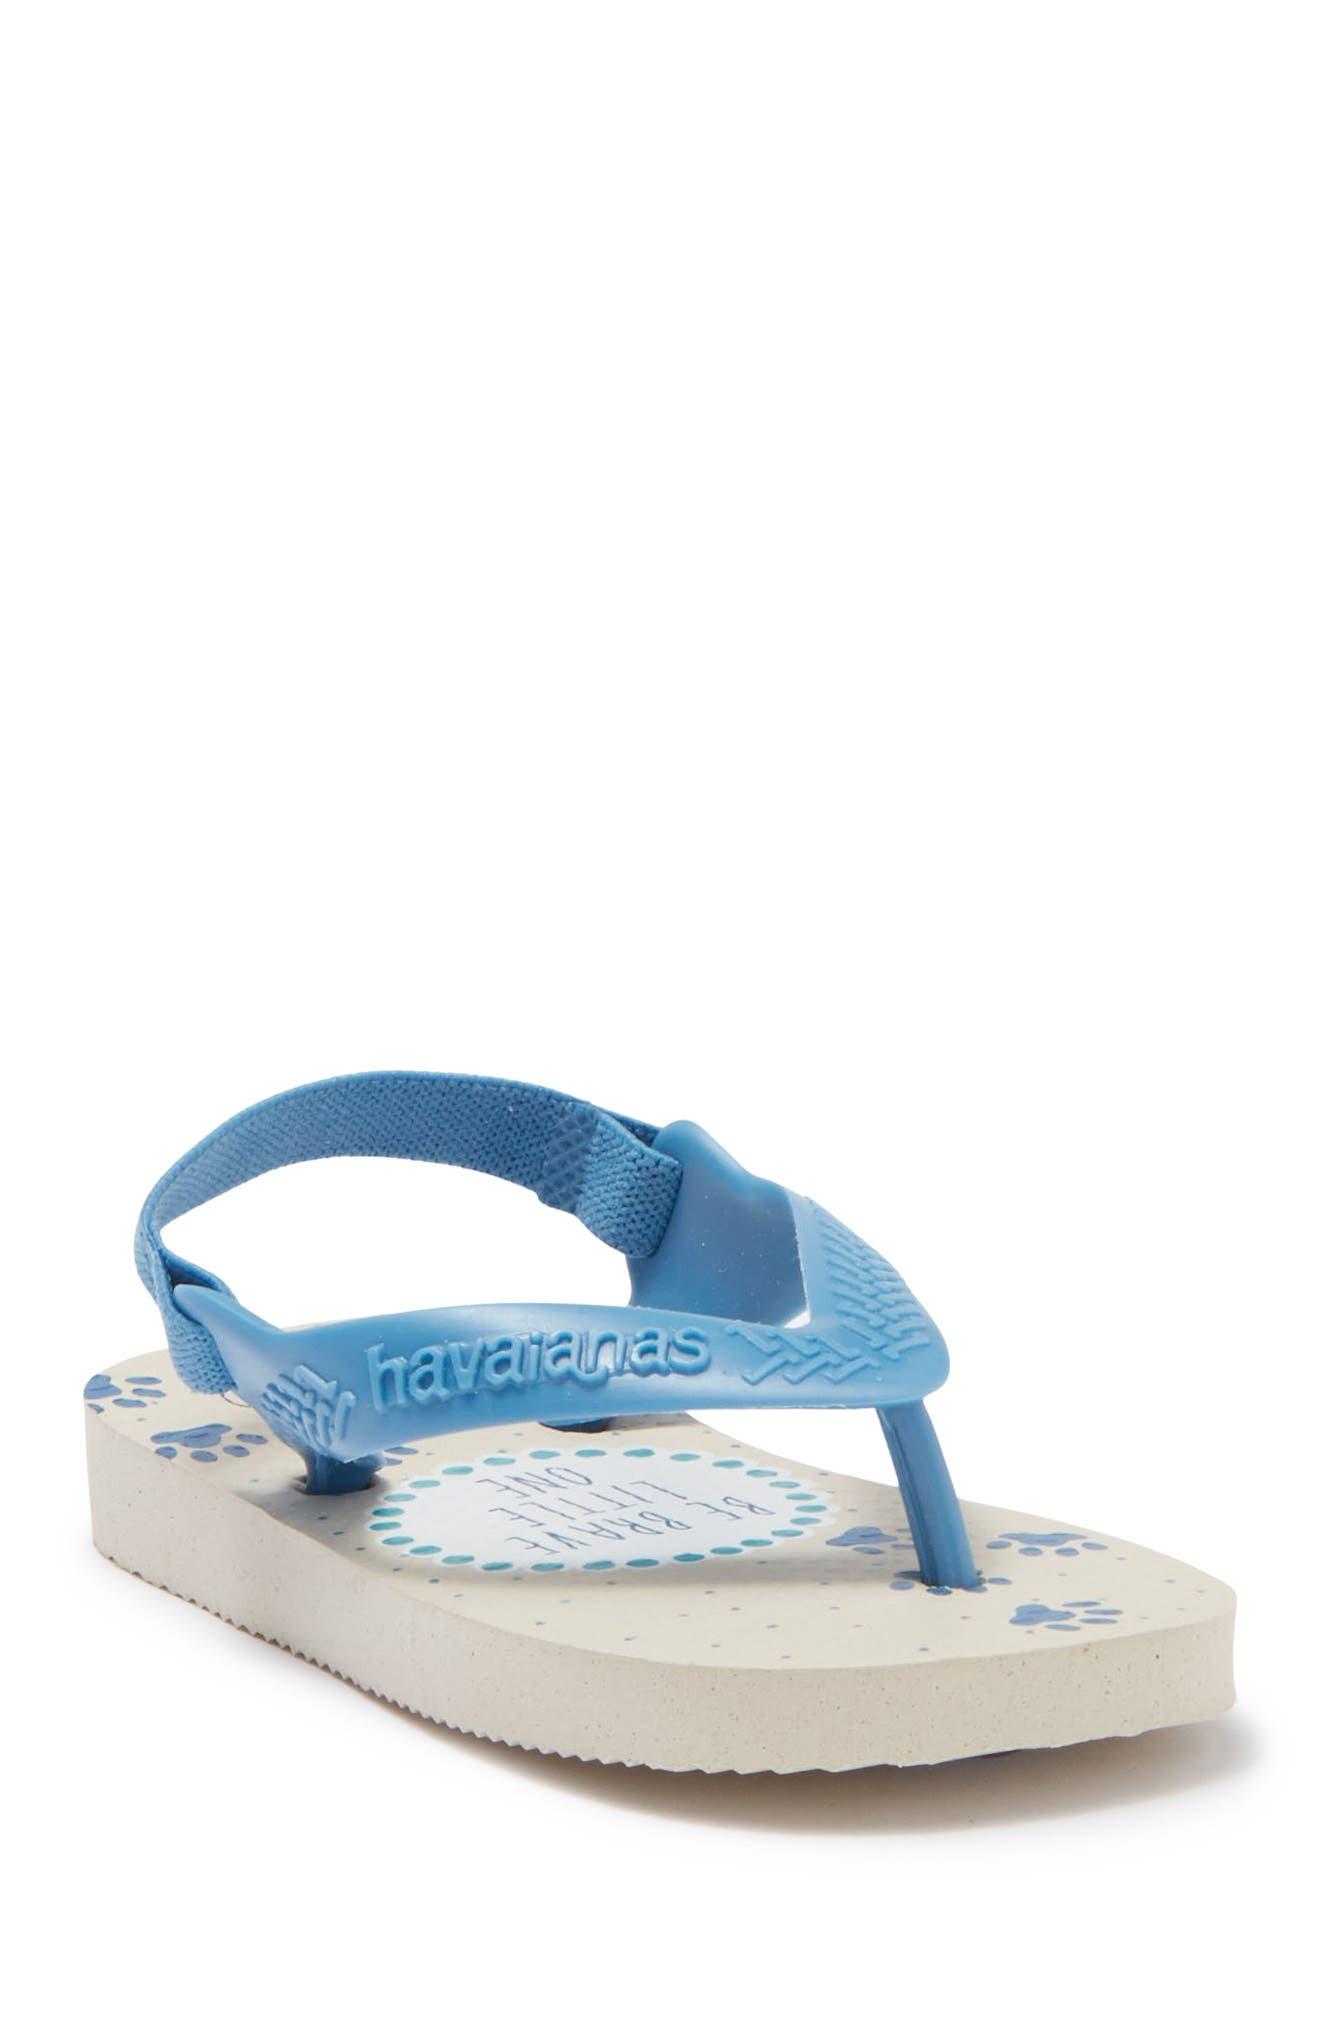 Havaianas Kids Pets Flip Flop Sandals Infant//Toddler